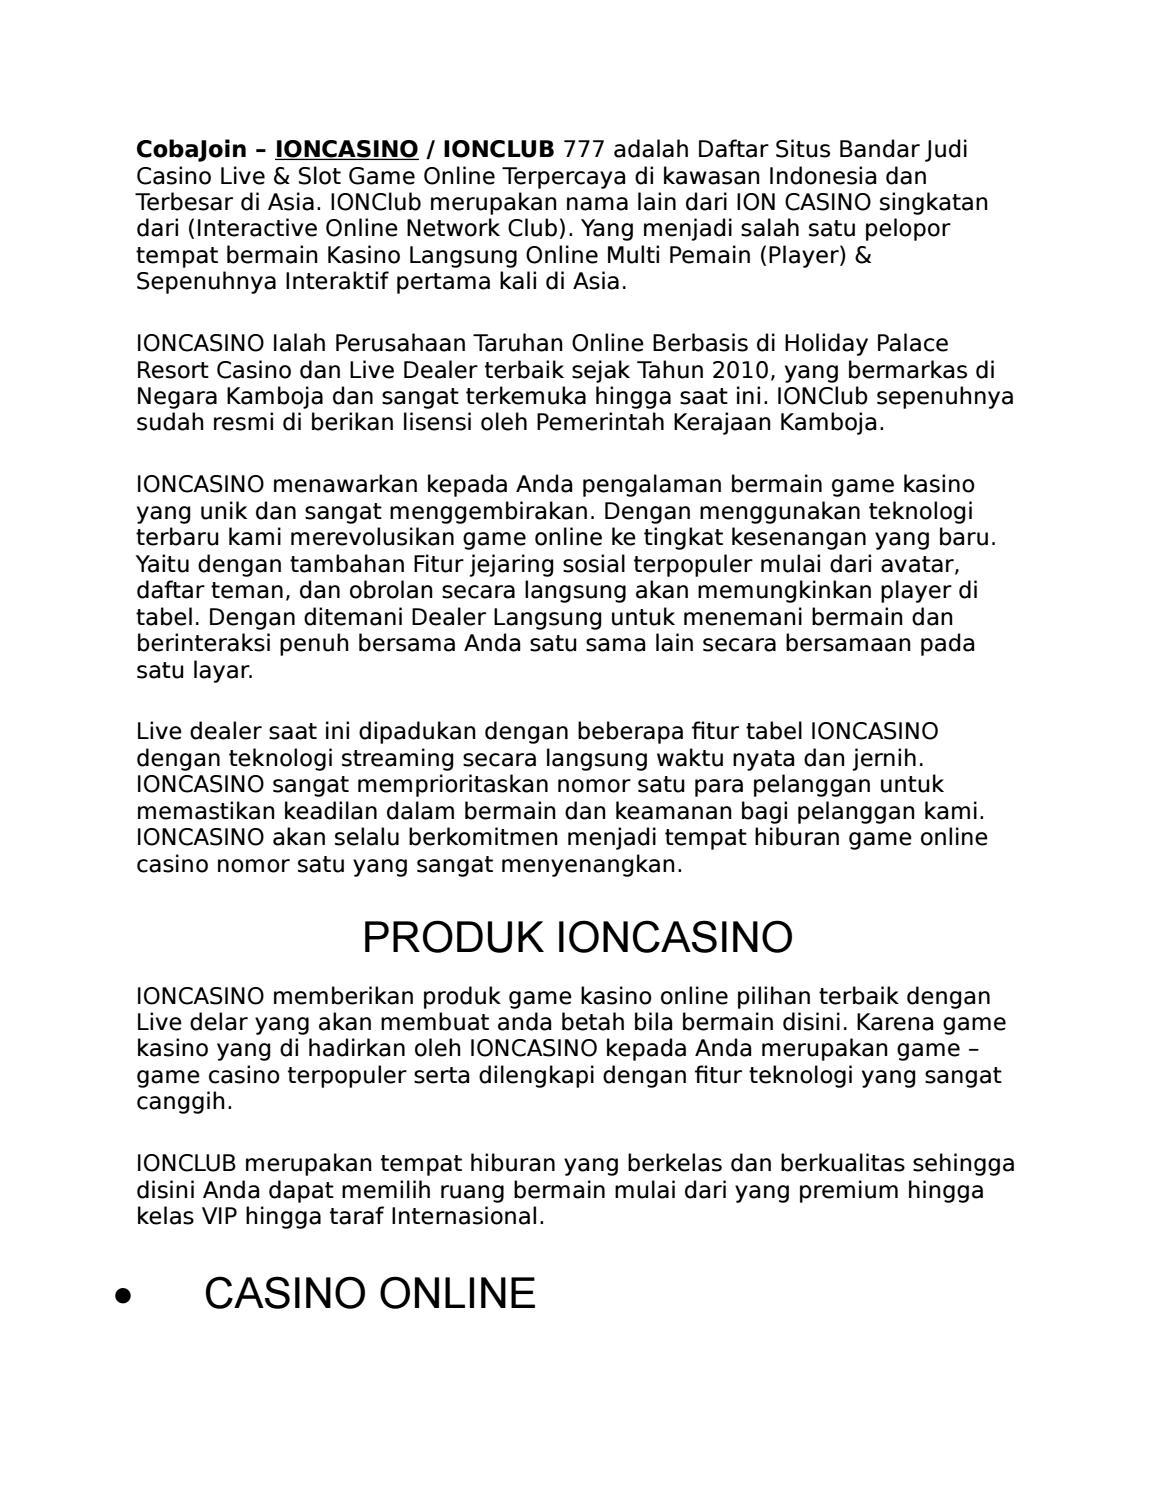 Ion Casino Cobajoin By Viona188 Issuu